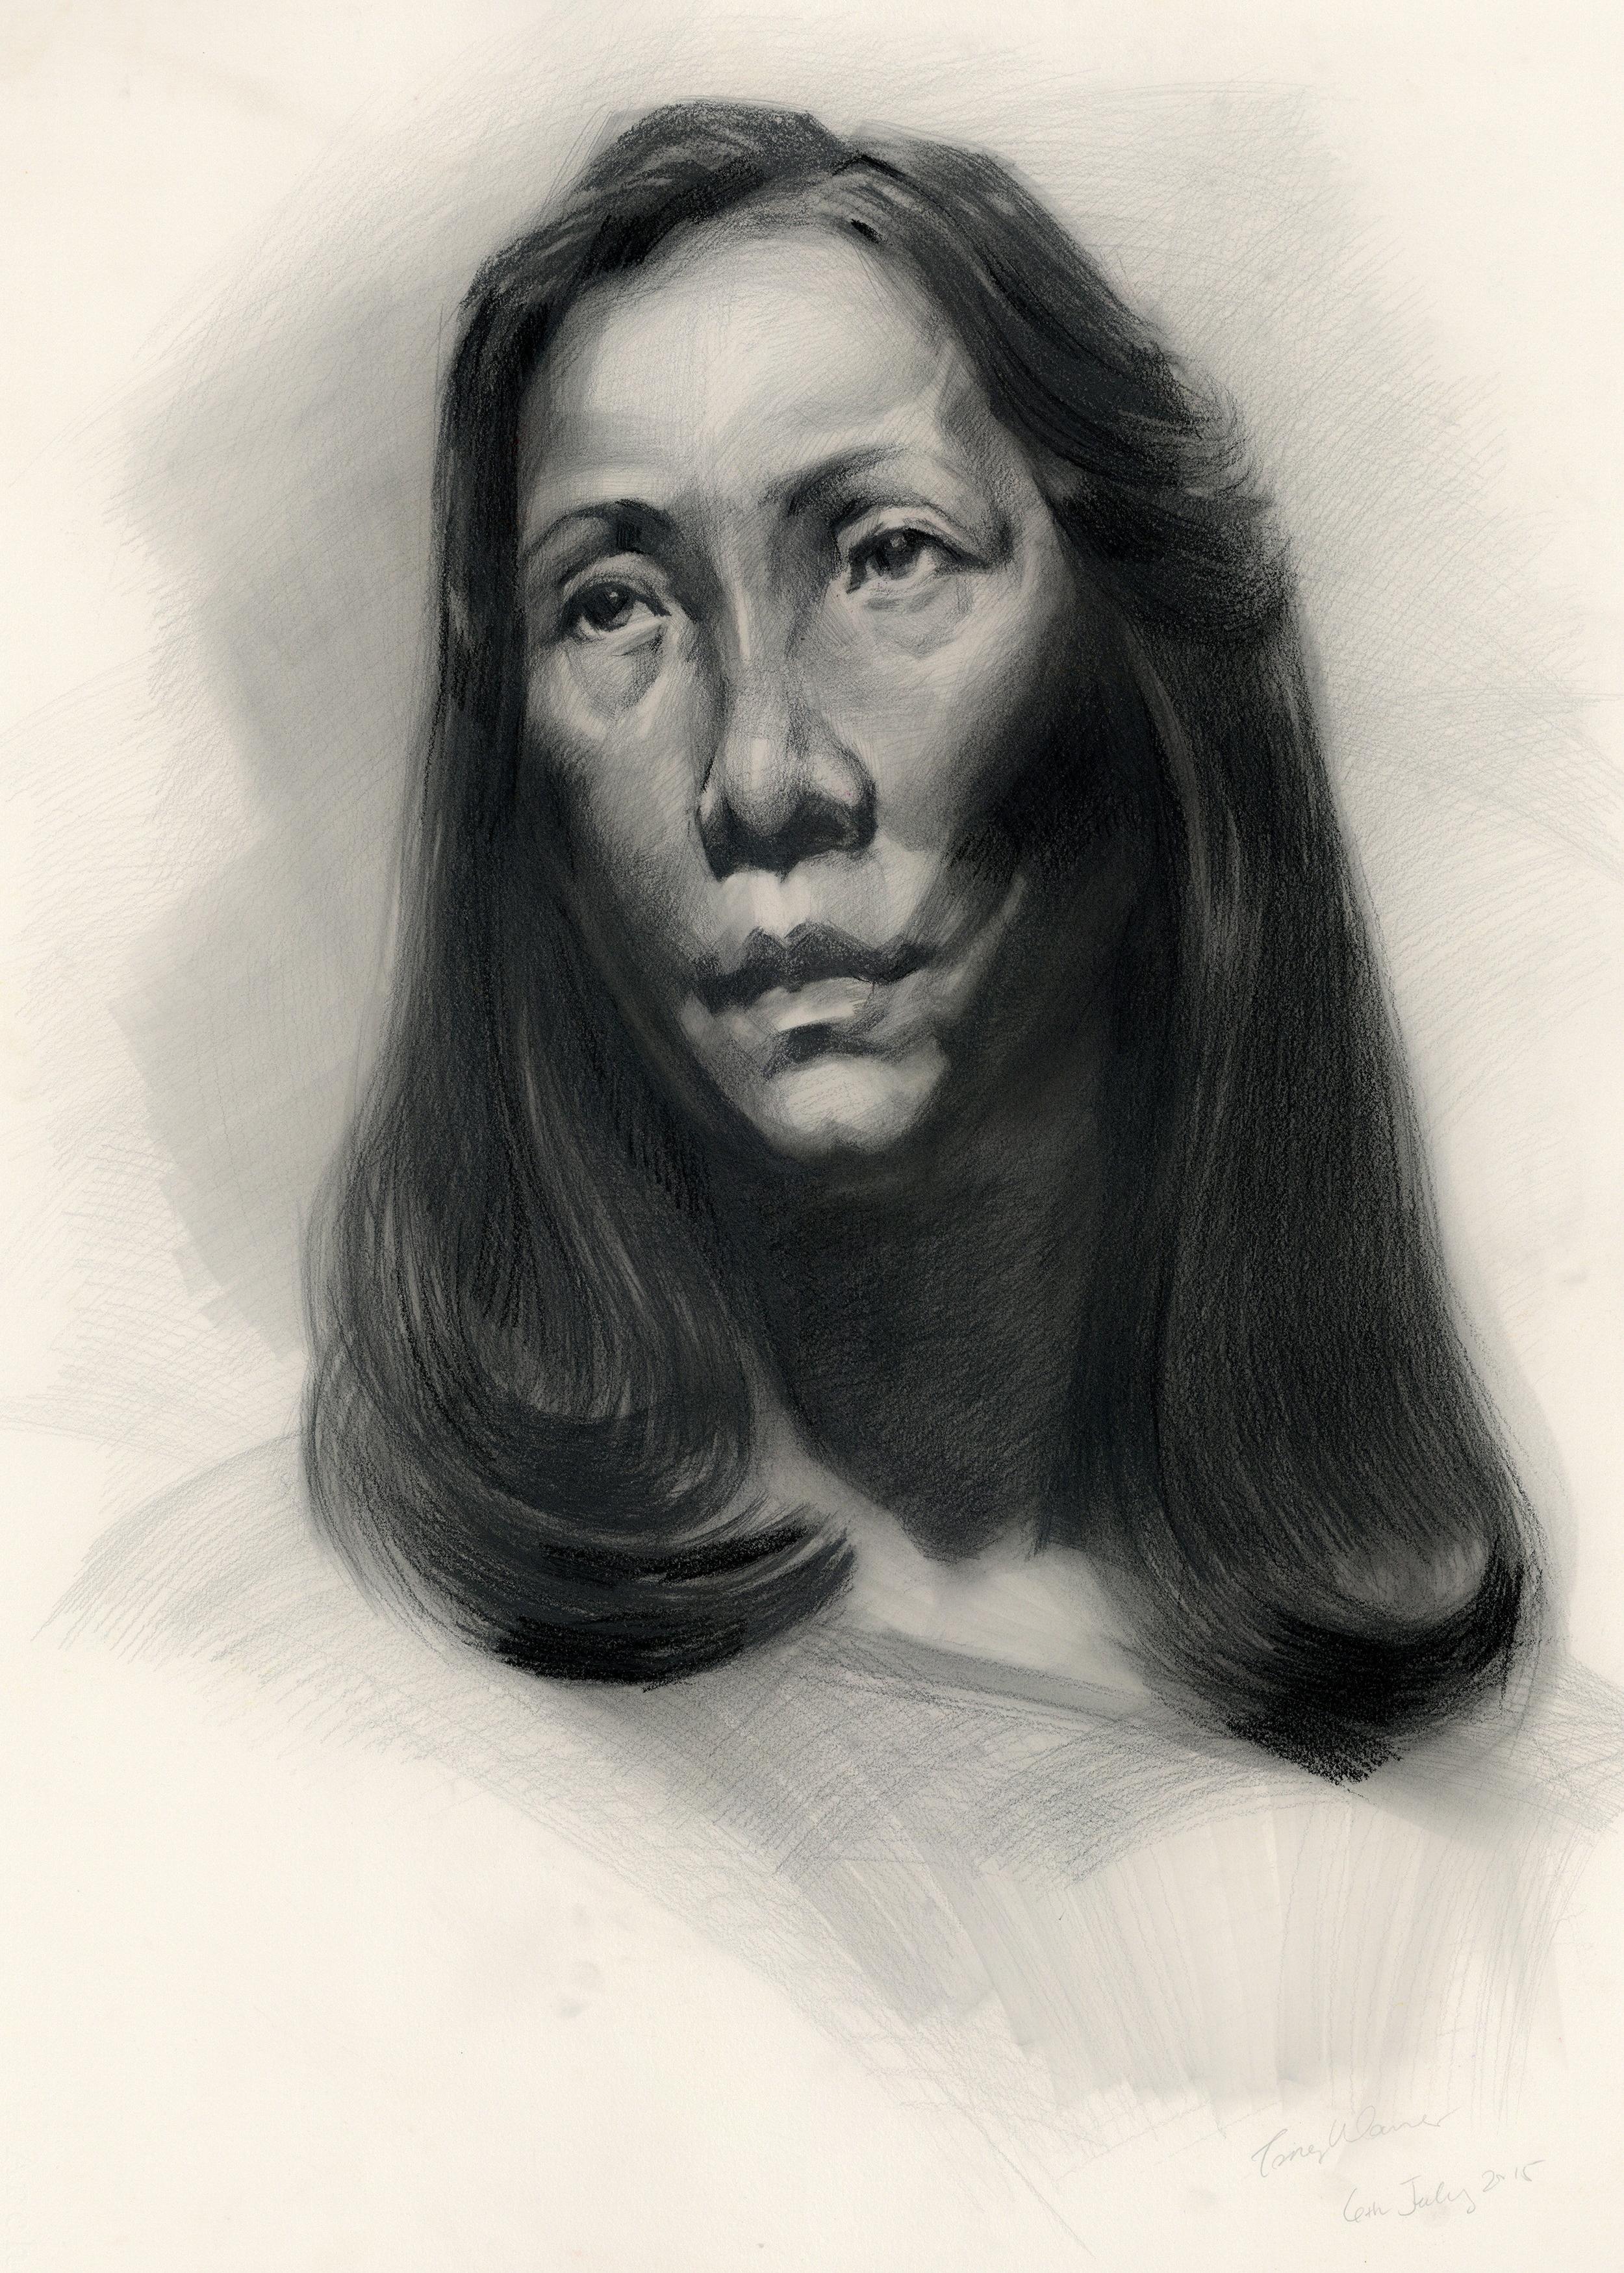 Untitled Portrait, 20in x 30in, Pencil, 2015